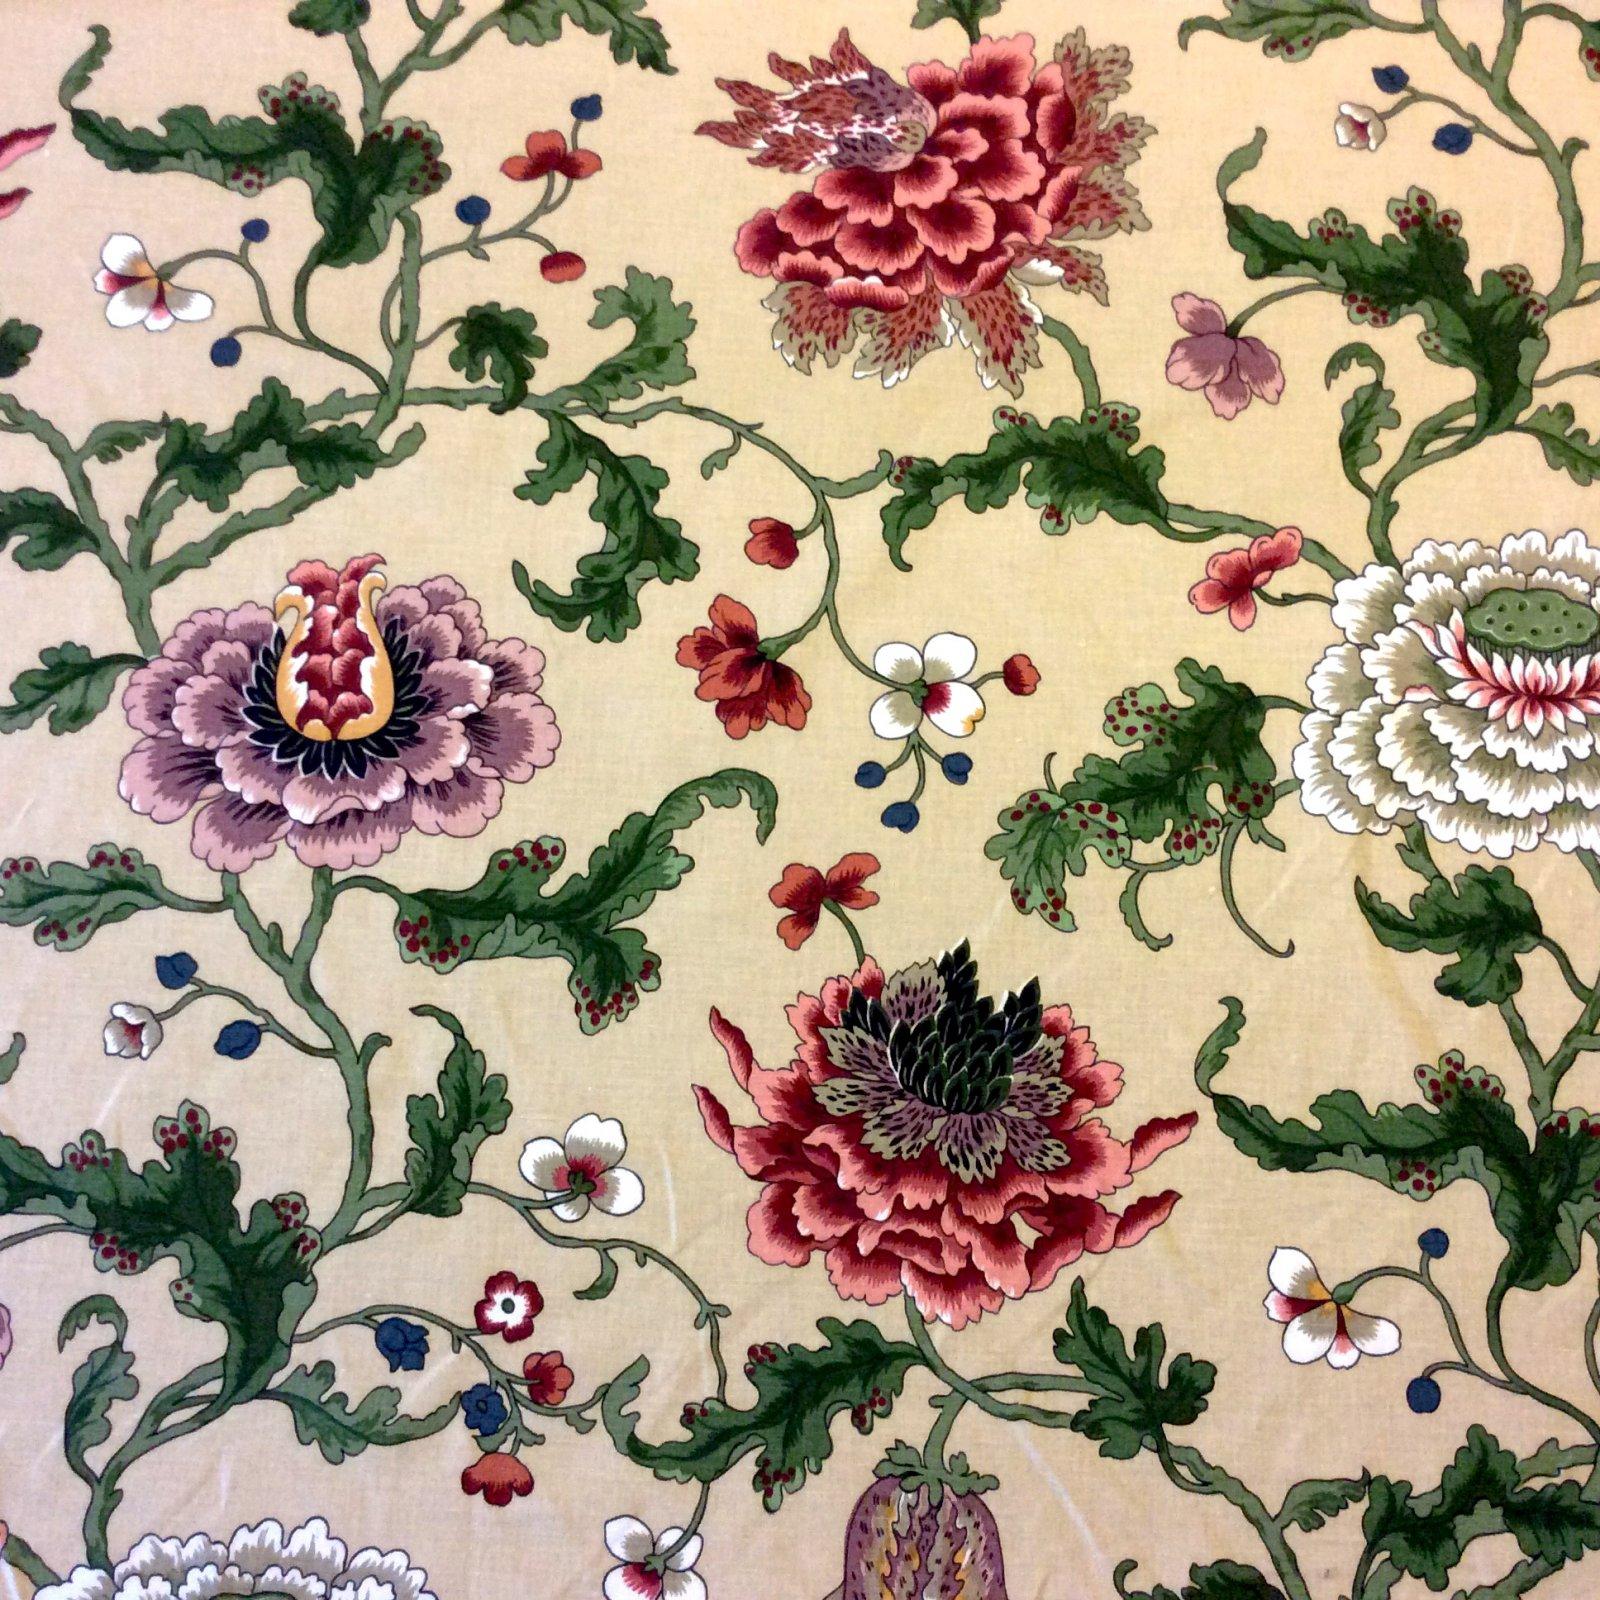 Brunschwig & Fils Athos Chotard Paris Mario Buatta Cotton Floral Fabric Architectural Digest Feature Upholstery Fabric  HDA045